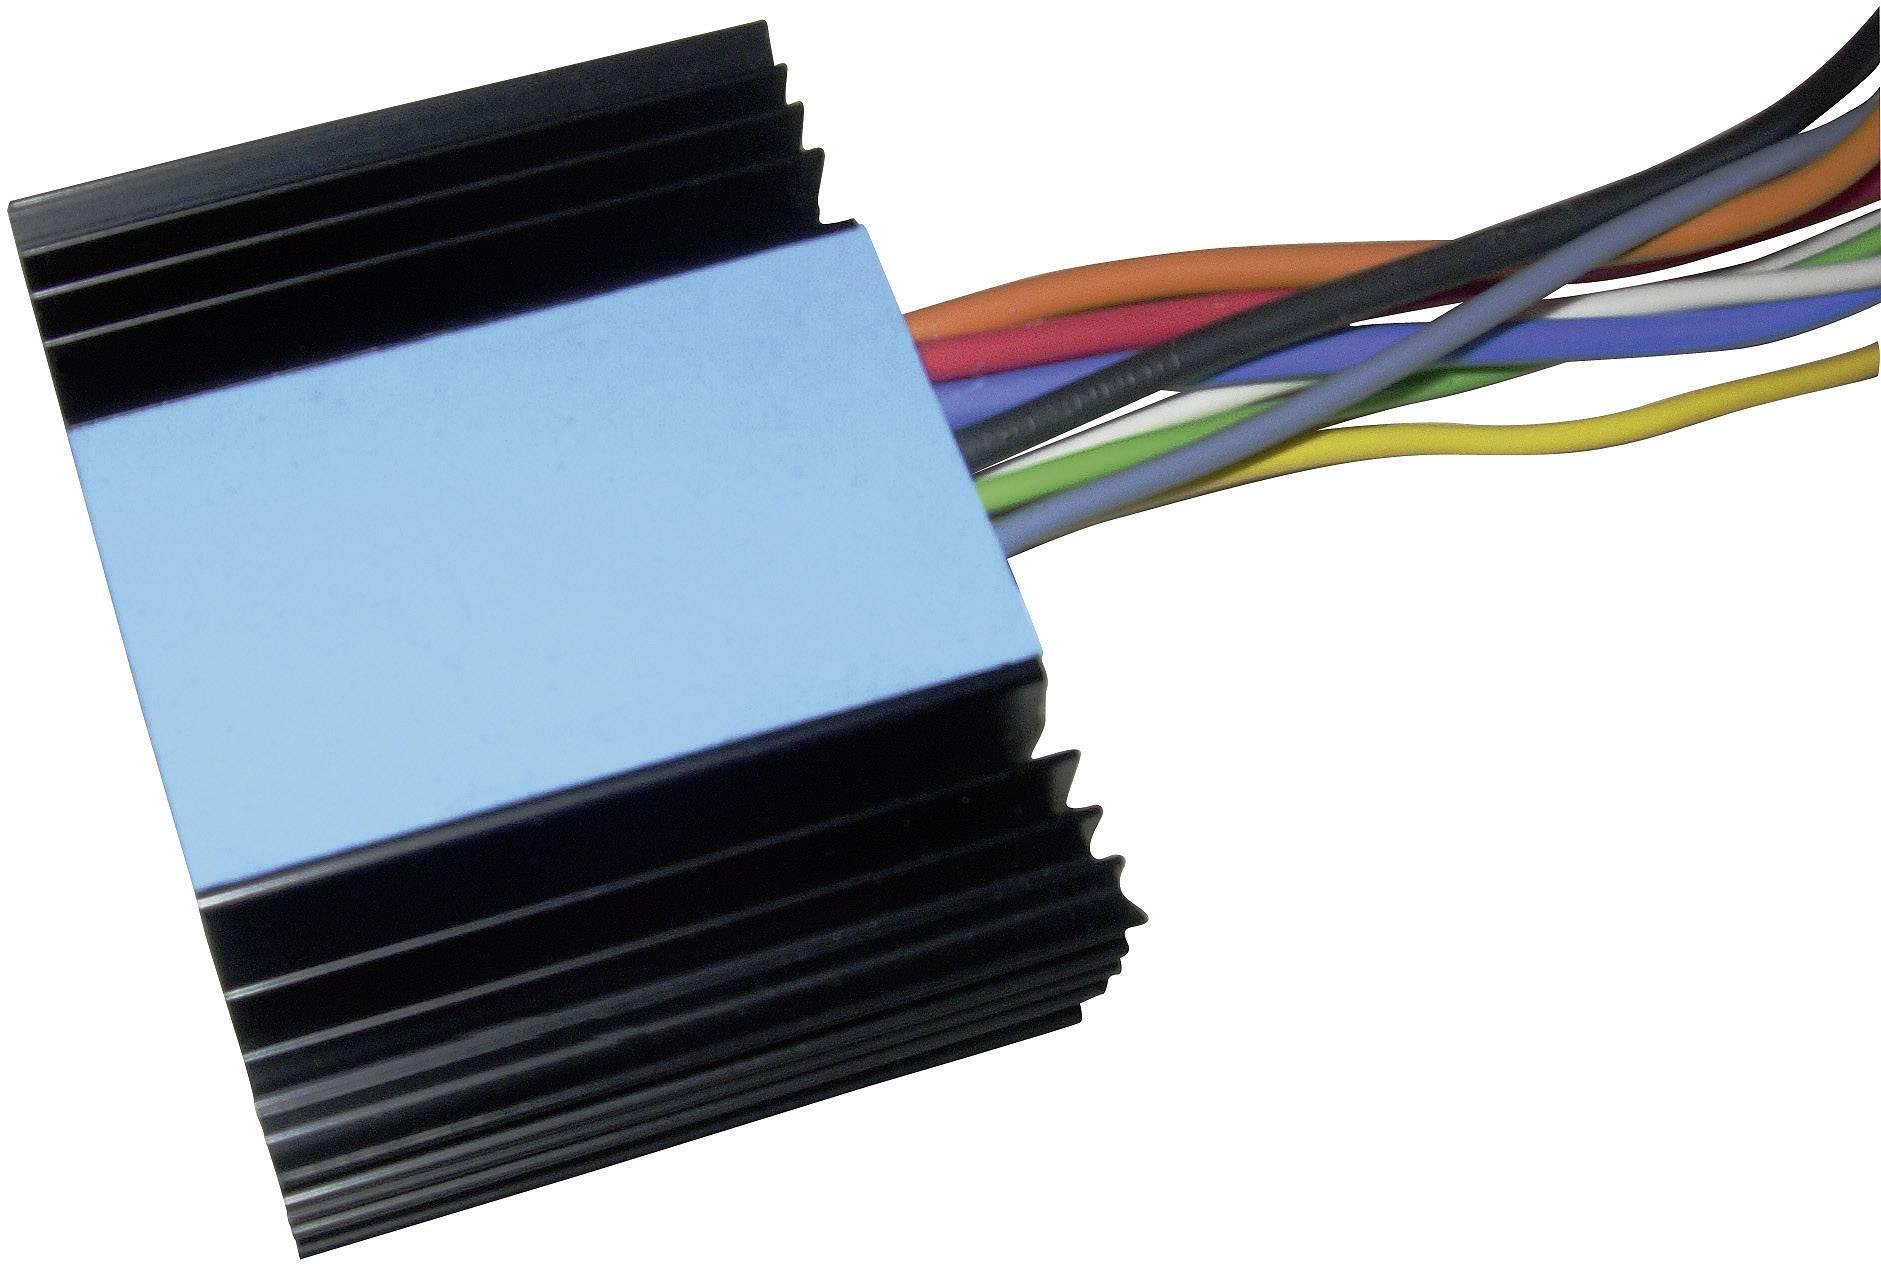 Peltierov ovládač QuickCool QC-PC-C01C, 12 V, 10 A